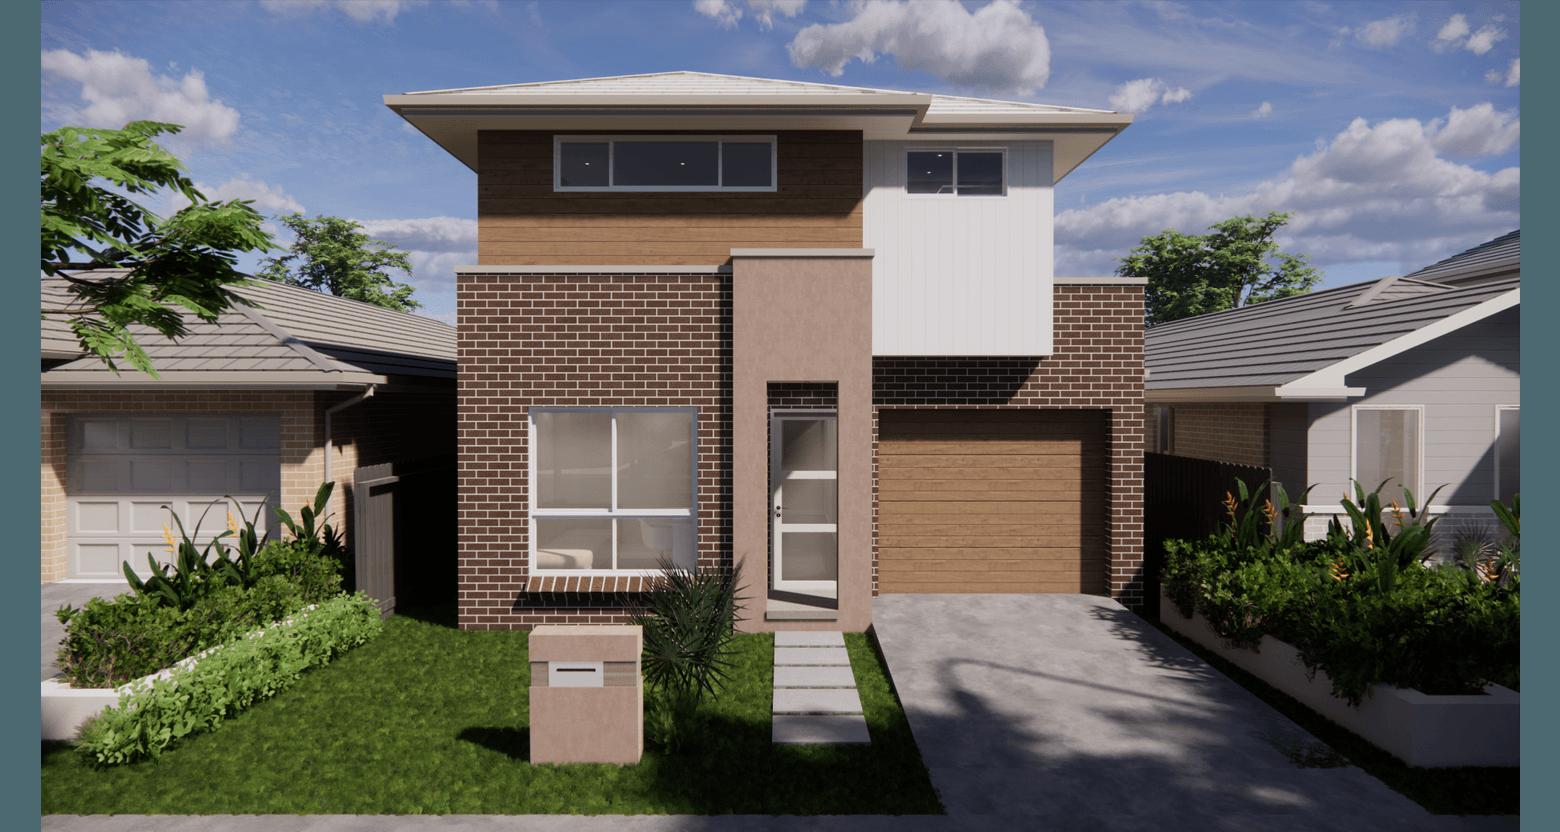 Lot 32 Pettitt Street, Riverstone, NSW 2765